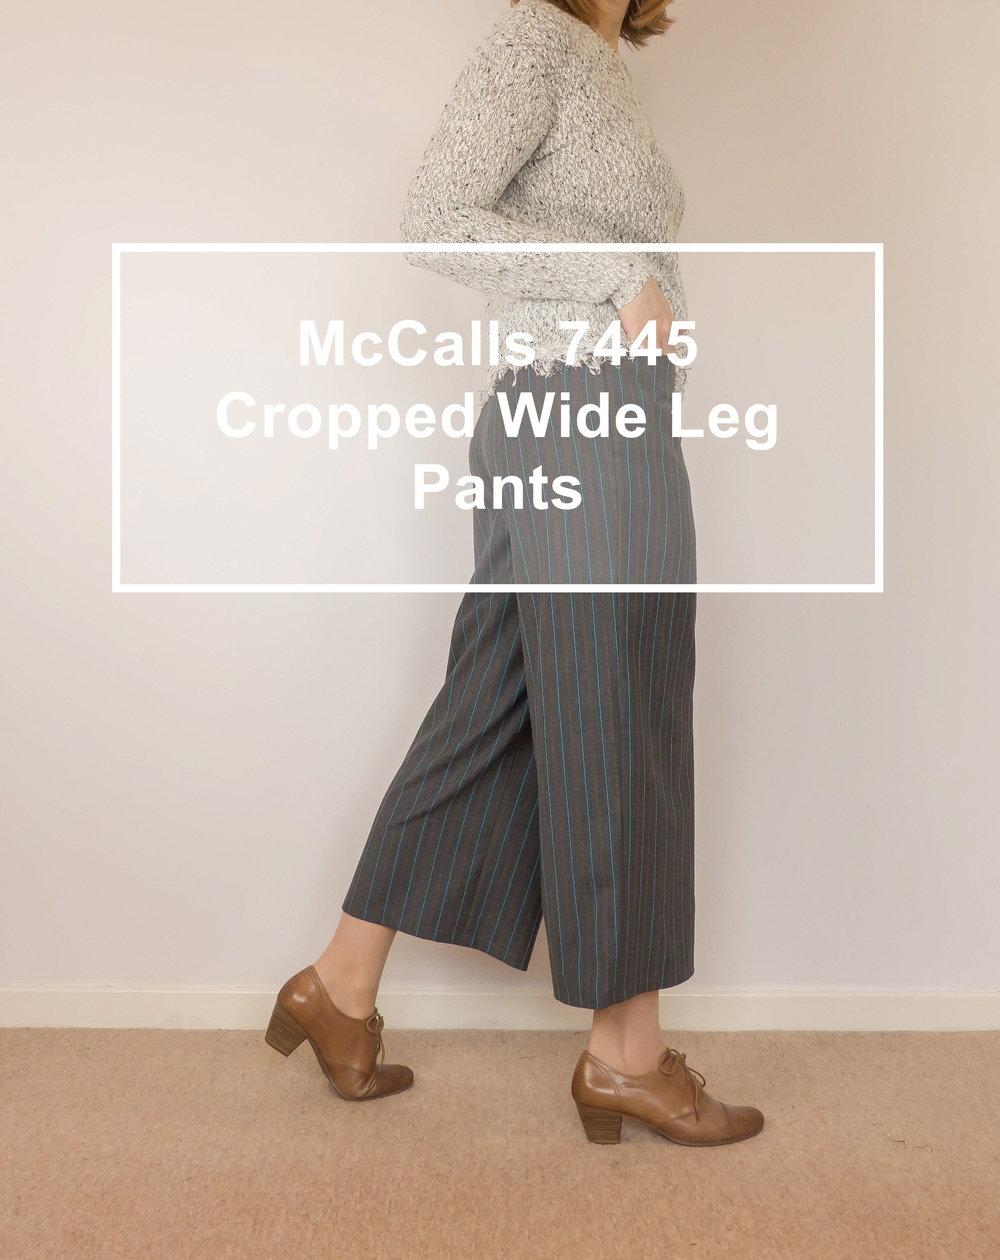 McCalls 7445 cropped wide leg pants